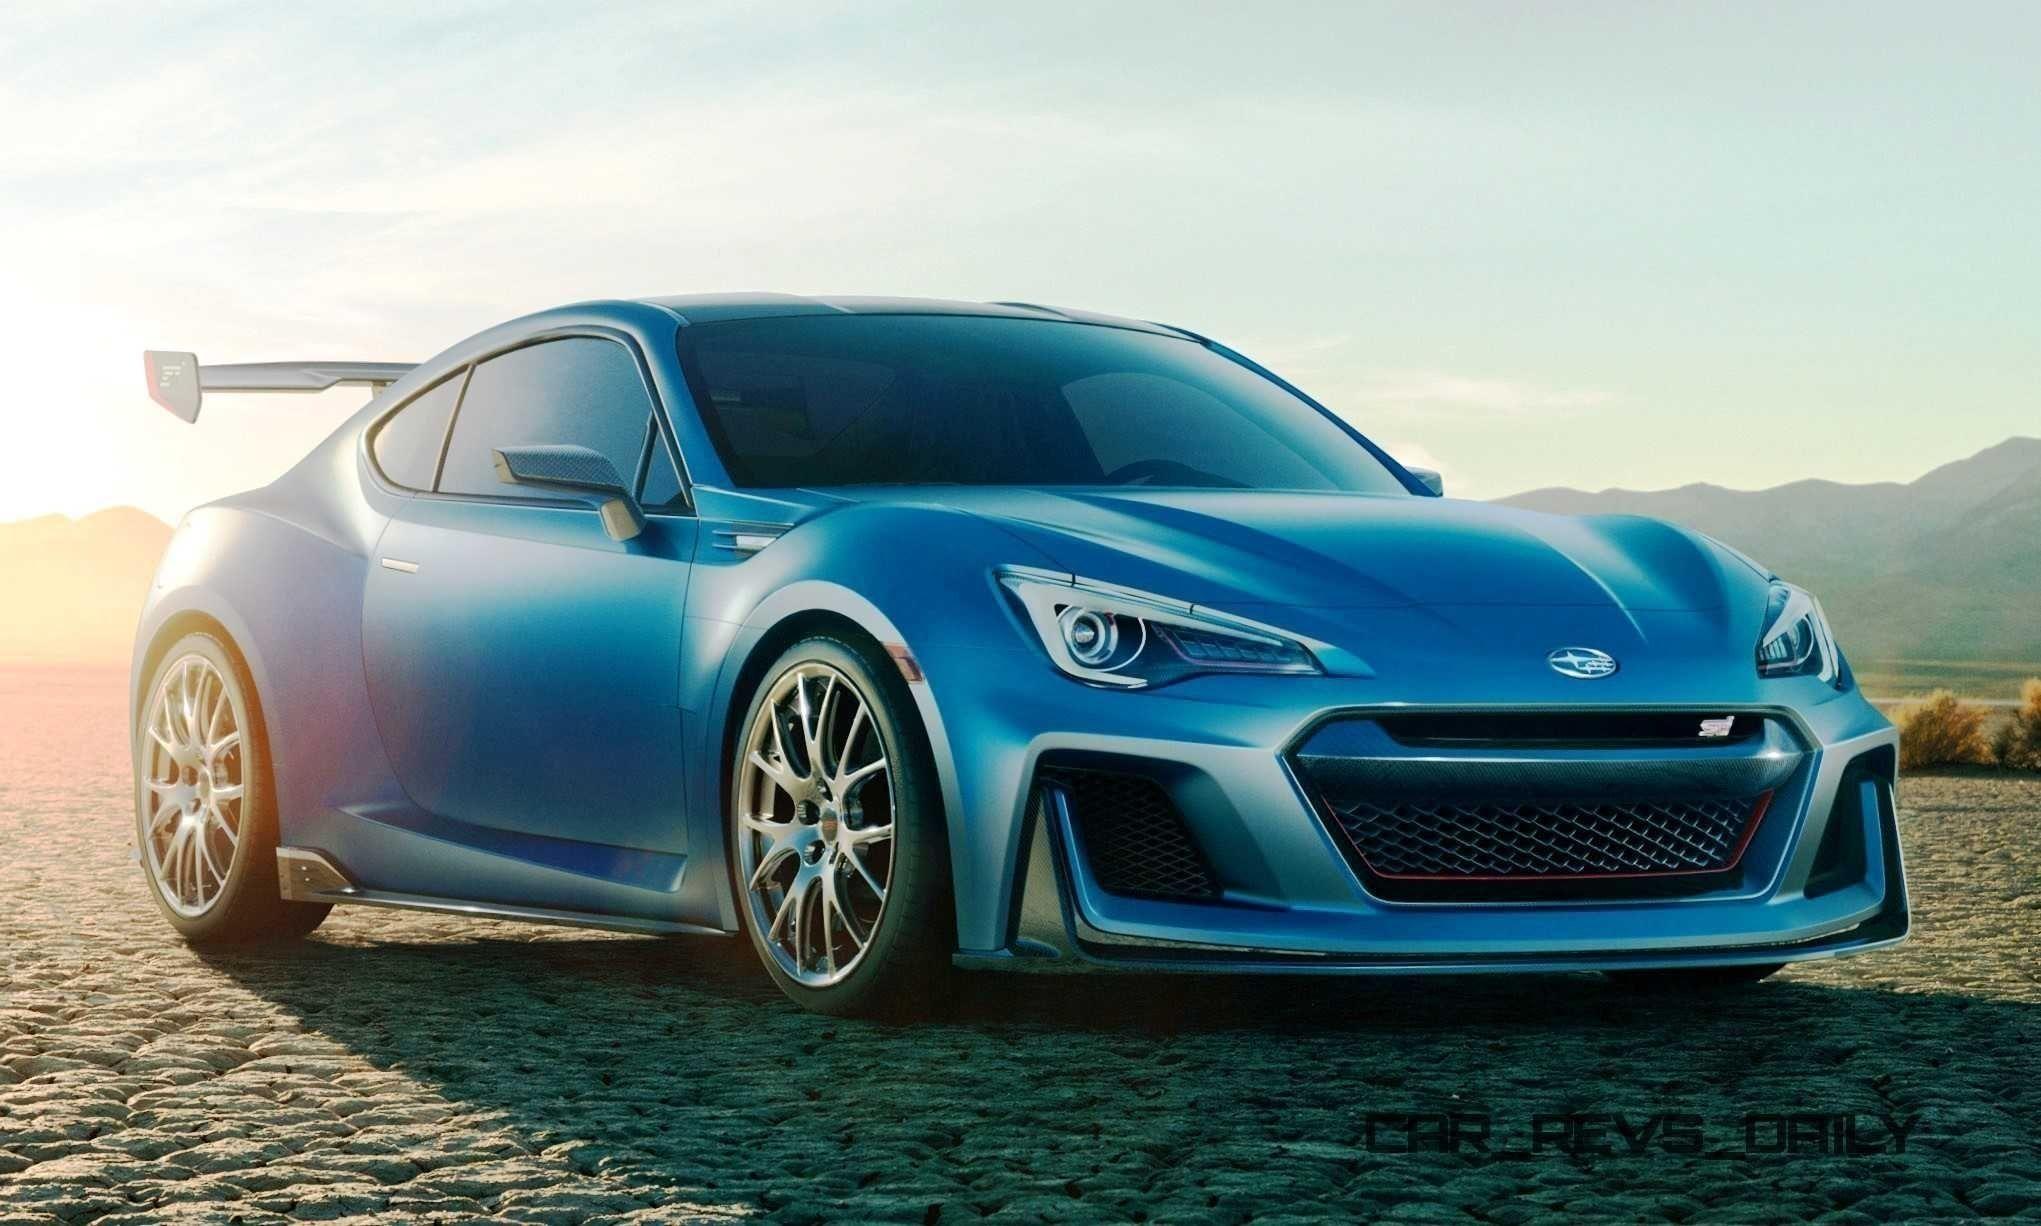 The Brz 2019 Performance Subaru brz sti, Subaru brz, Subaru